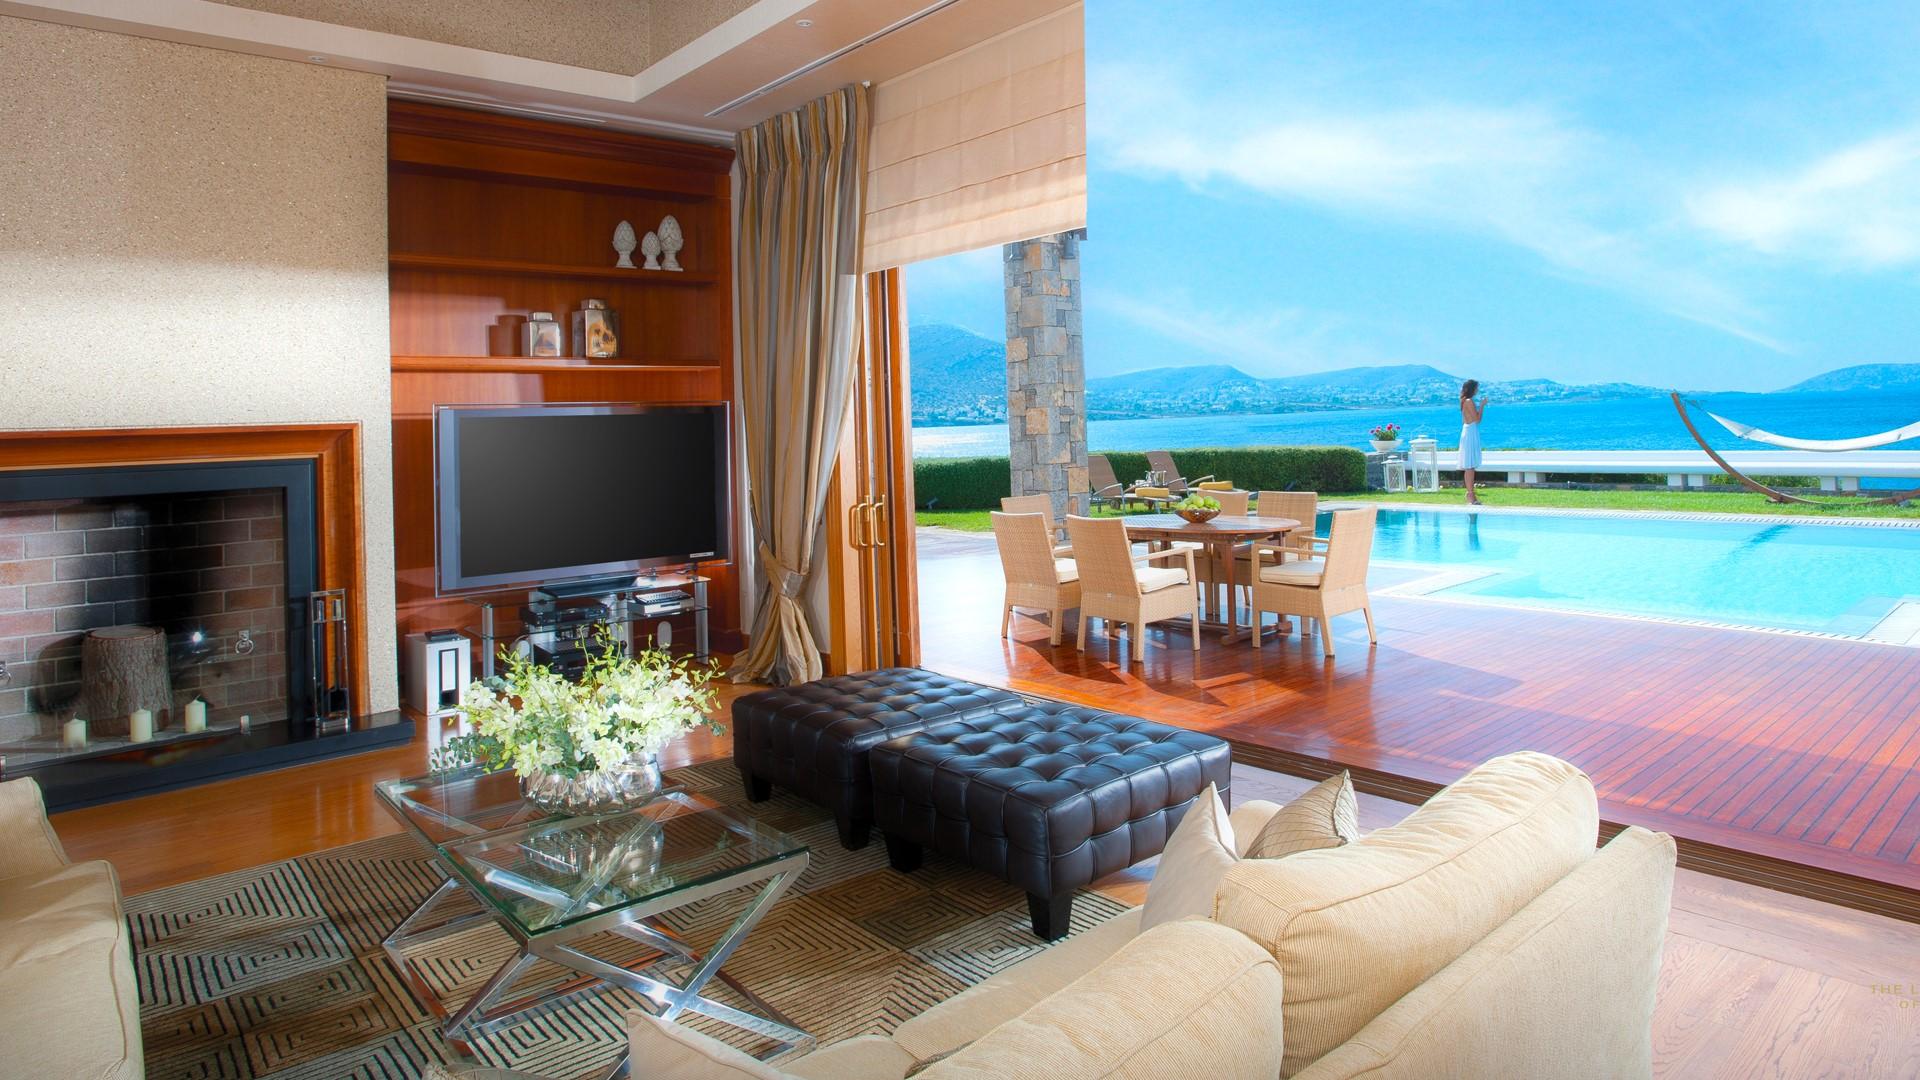 Royal_Villa_Grand_Resort_Lagonissi_Athens_Greece_Suite